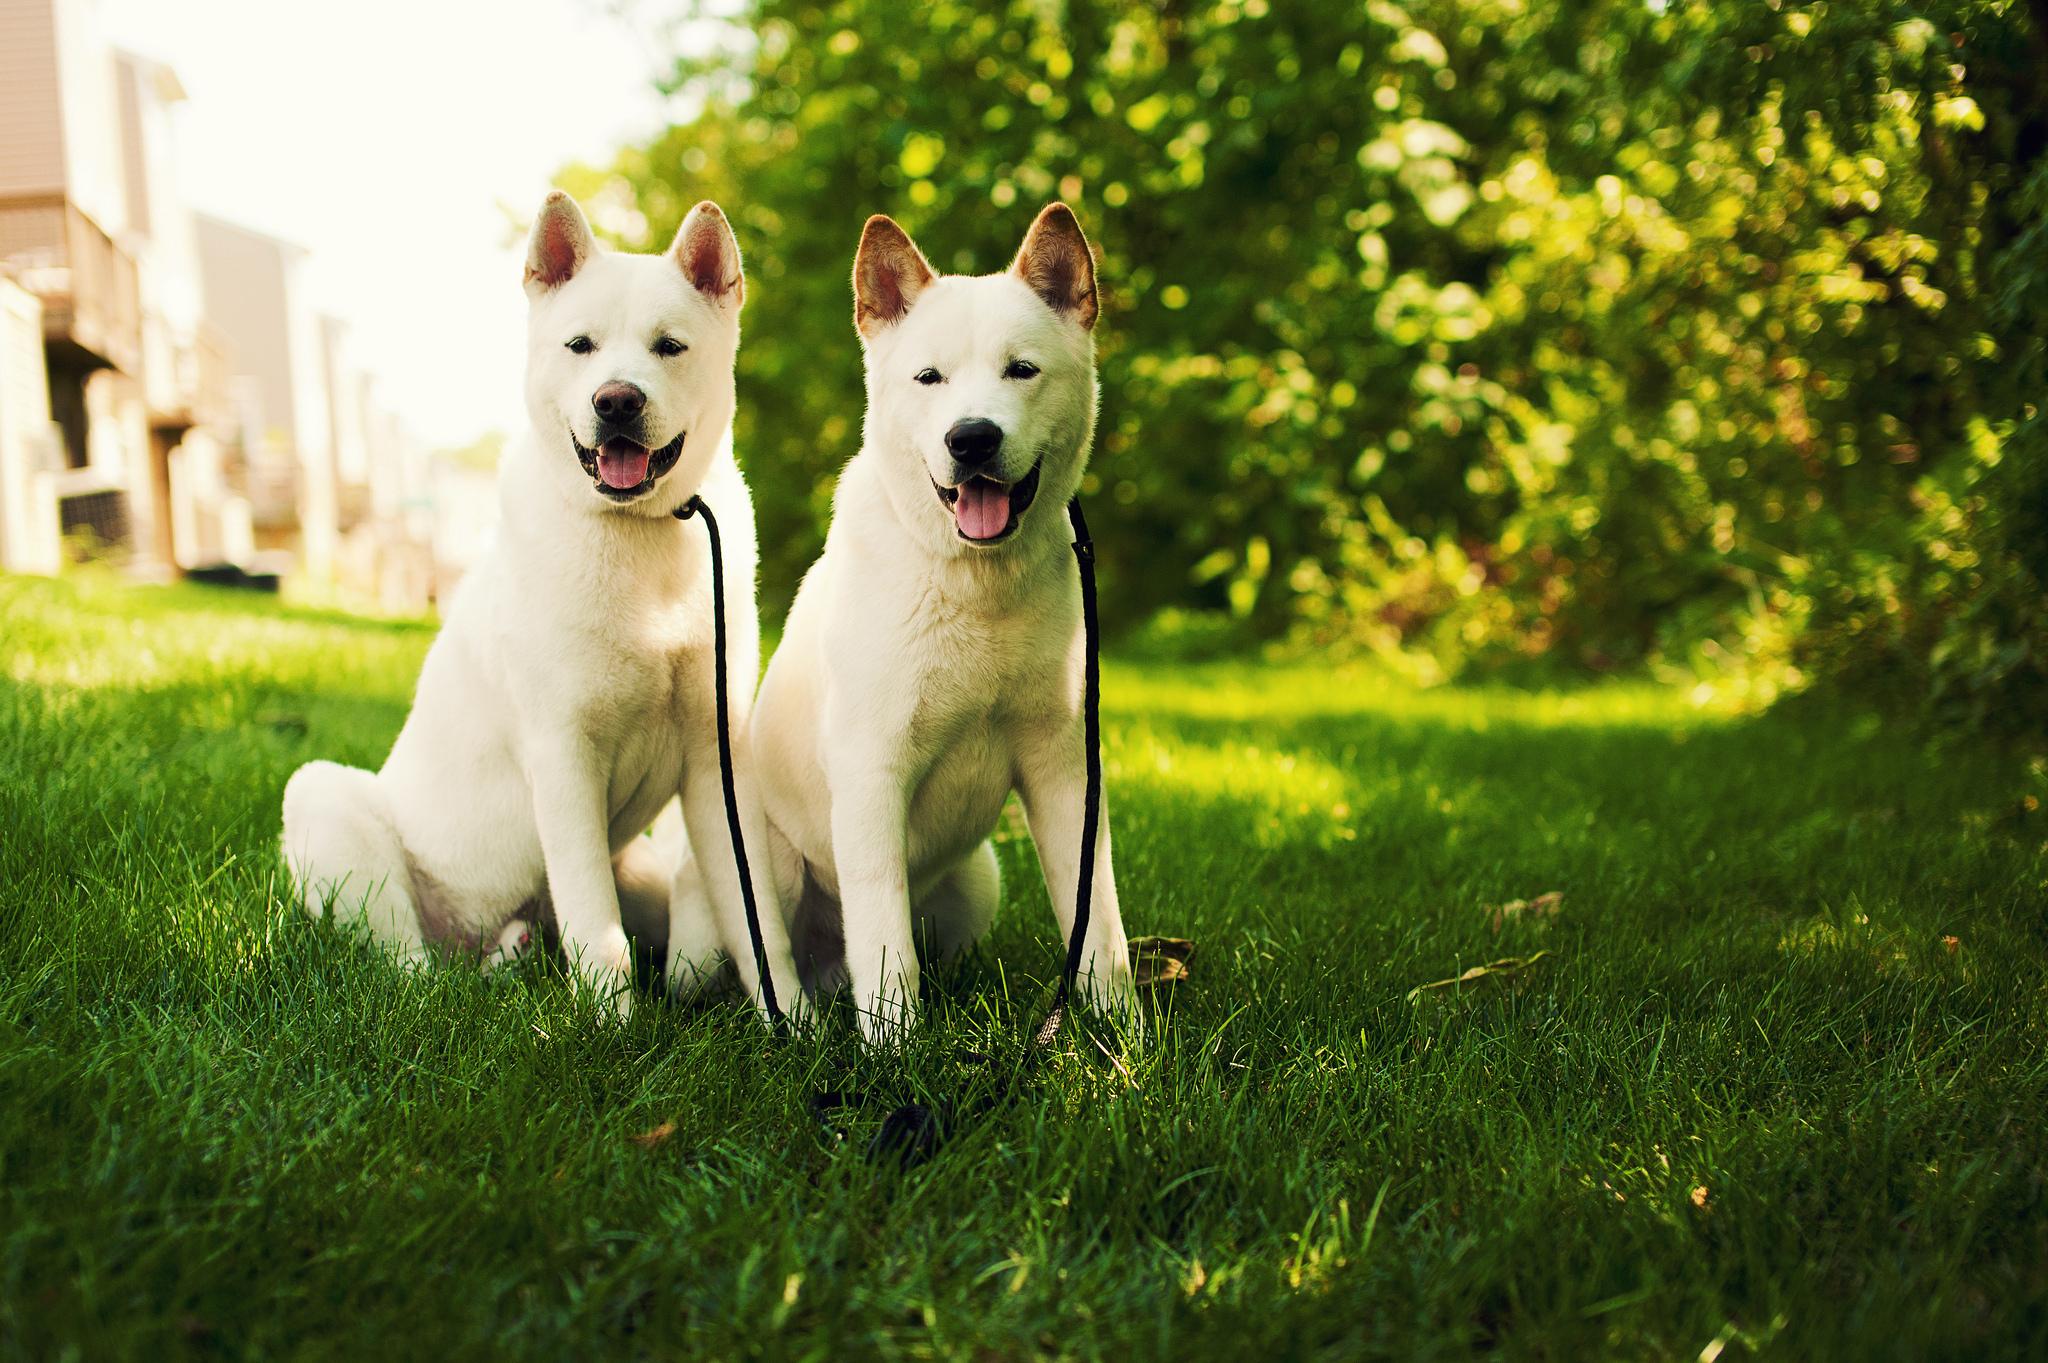 Two white Akita Inu dogs wallpaper